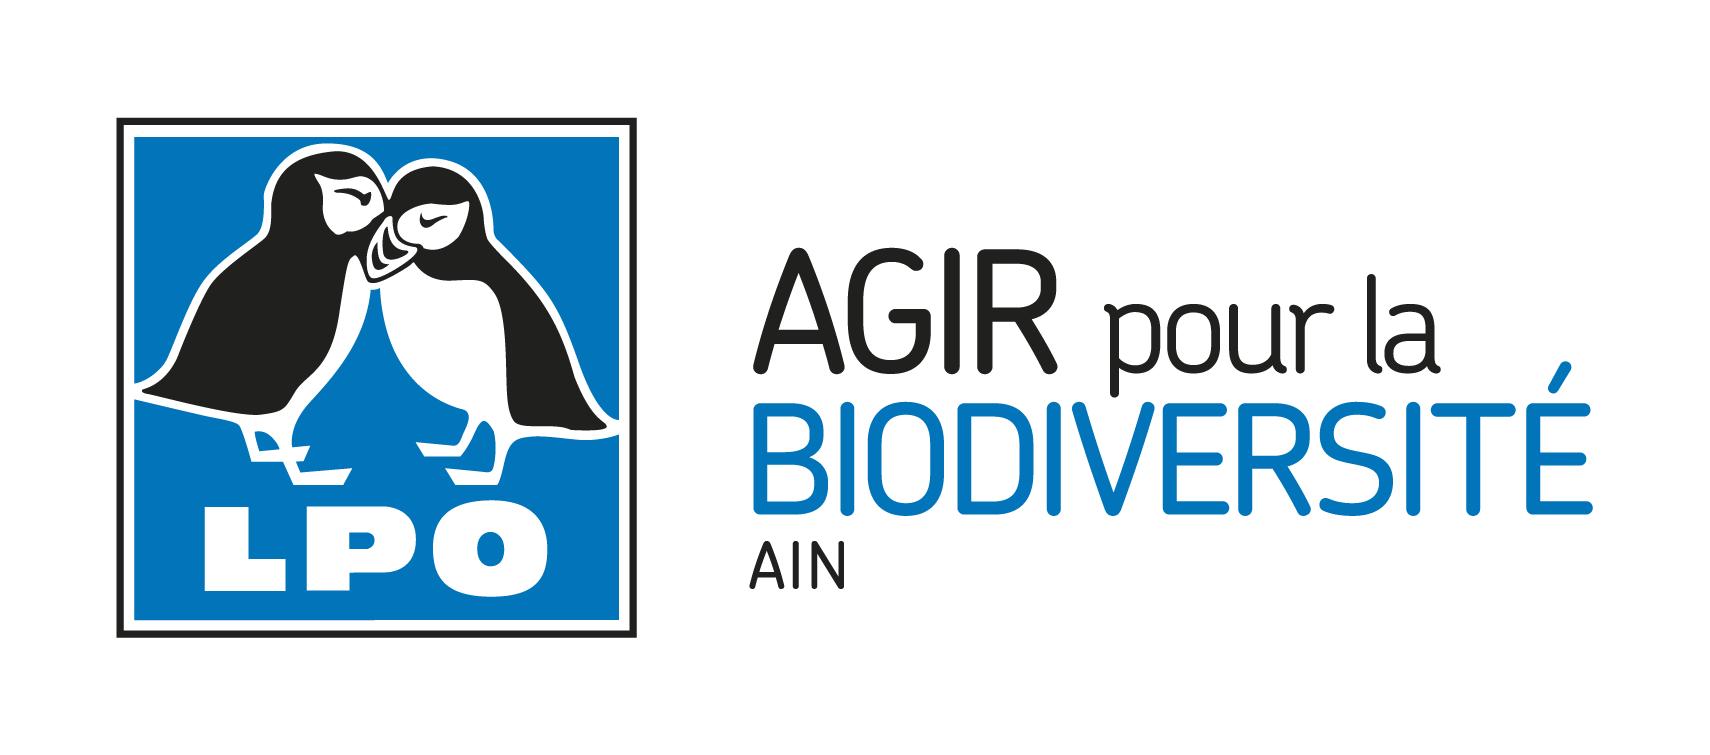 https://cdnfiles1.biolovision.net/www.faune-ain.org/userfiles/LPOAgirpourlabioAin.png